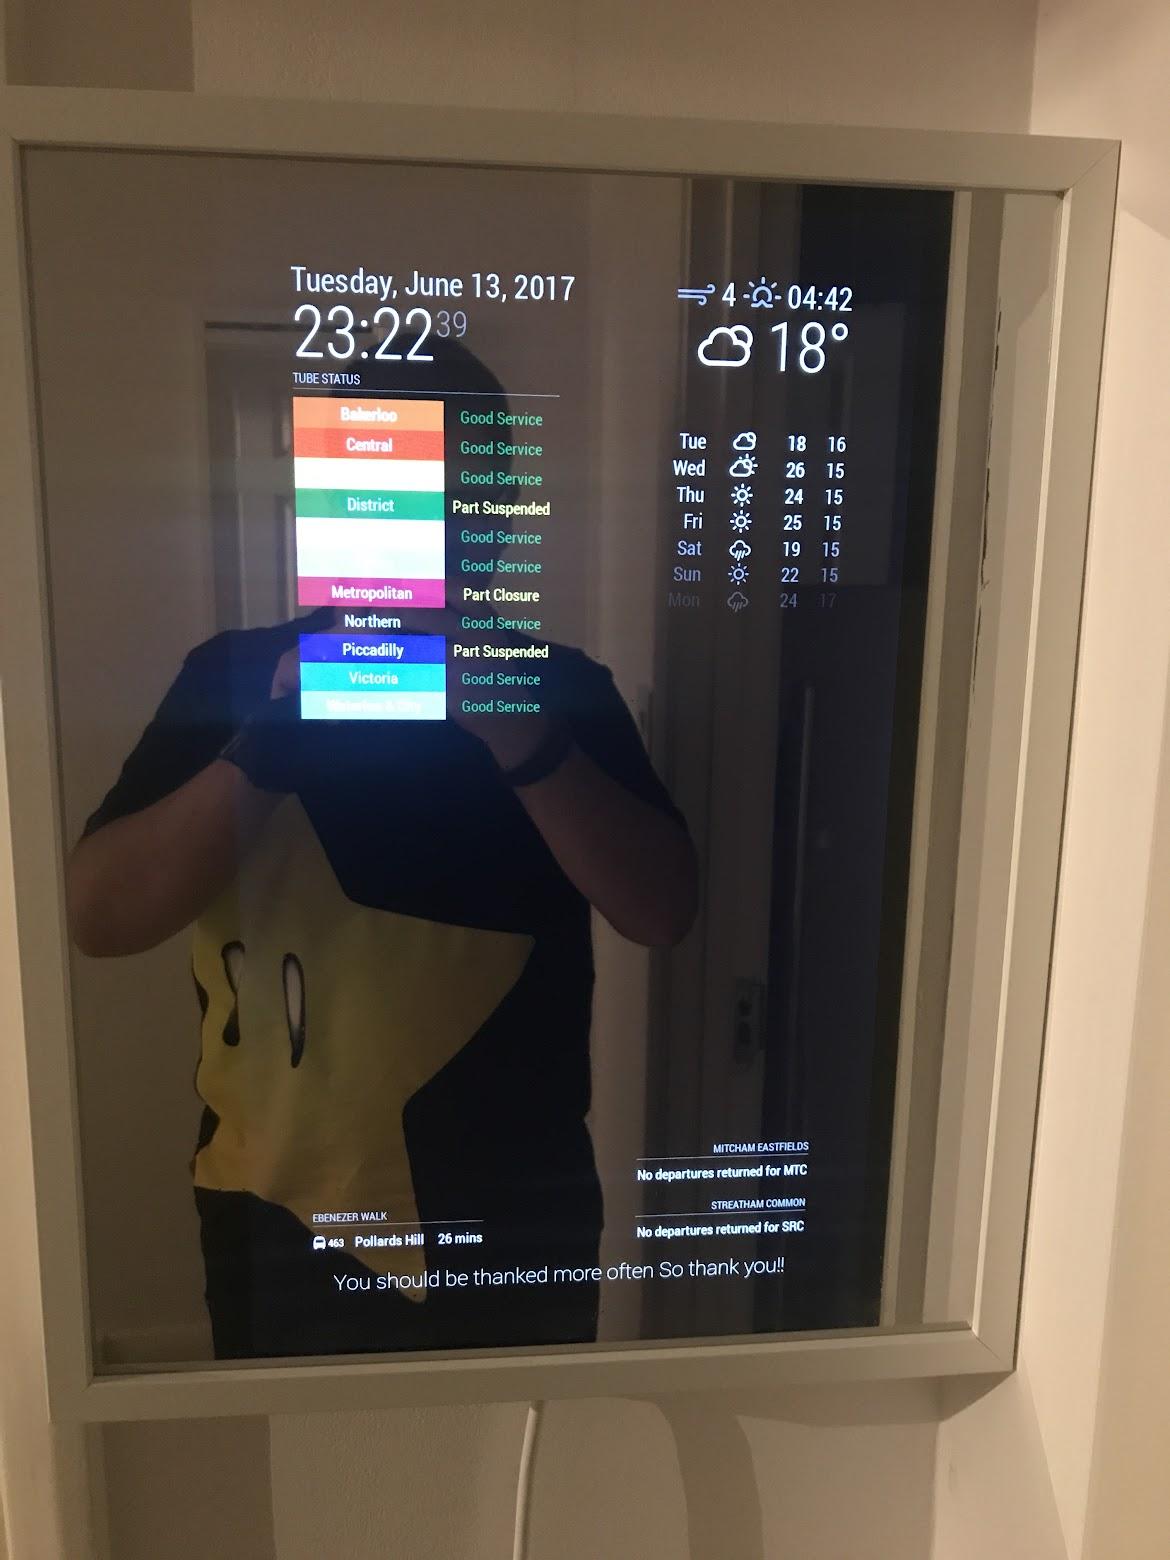 22\'\' Display + 40cmx50cm IKEA Frame + PIR Sensor | MagicMirror Forum